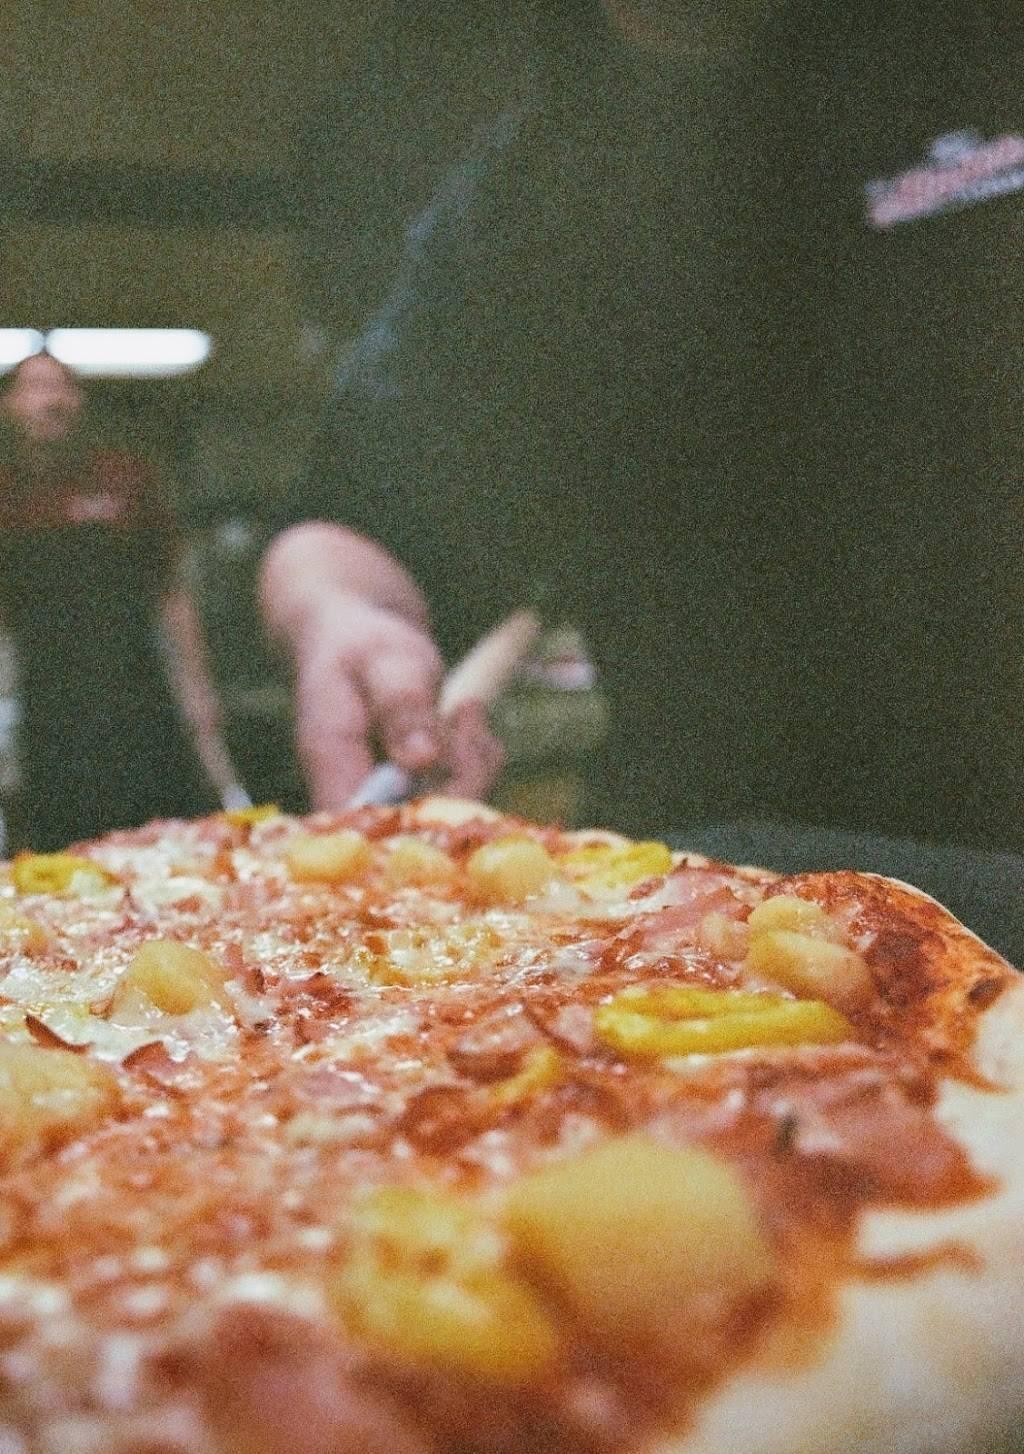 Contenders Pizzeria & Arcade | restaurant | 251 hickory hills shopping center, Hillsville, VA 24343, USA | 2767792002 OR +1 276-779-2002